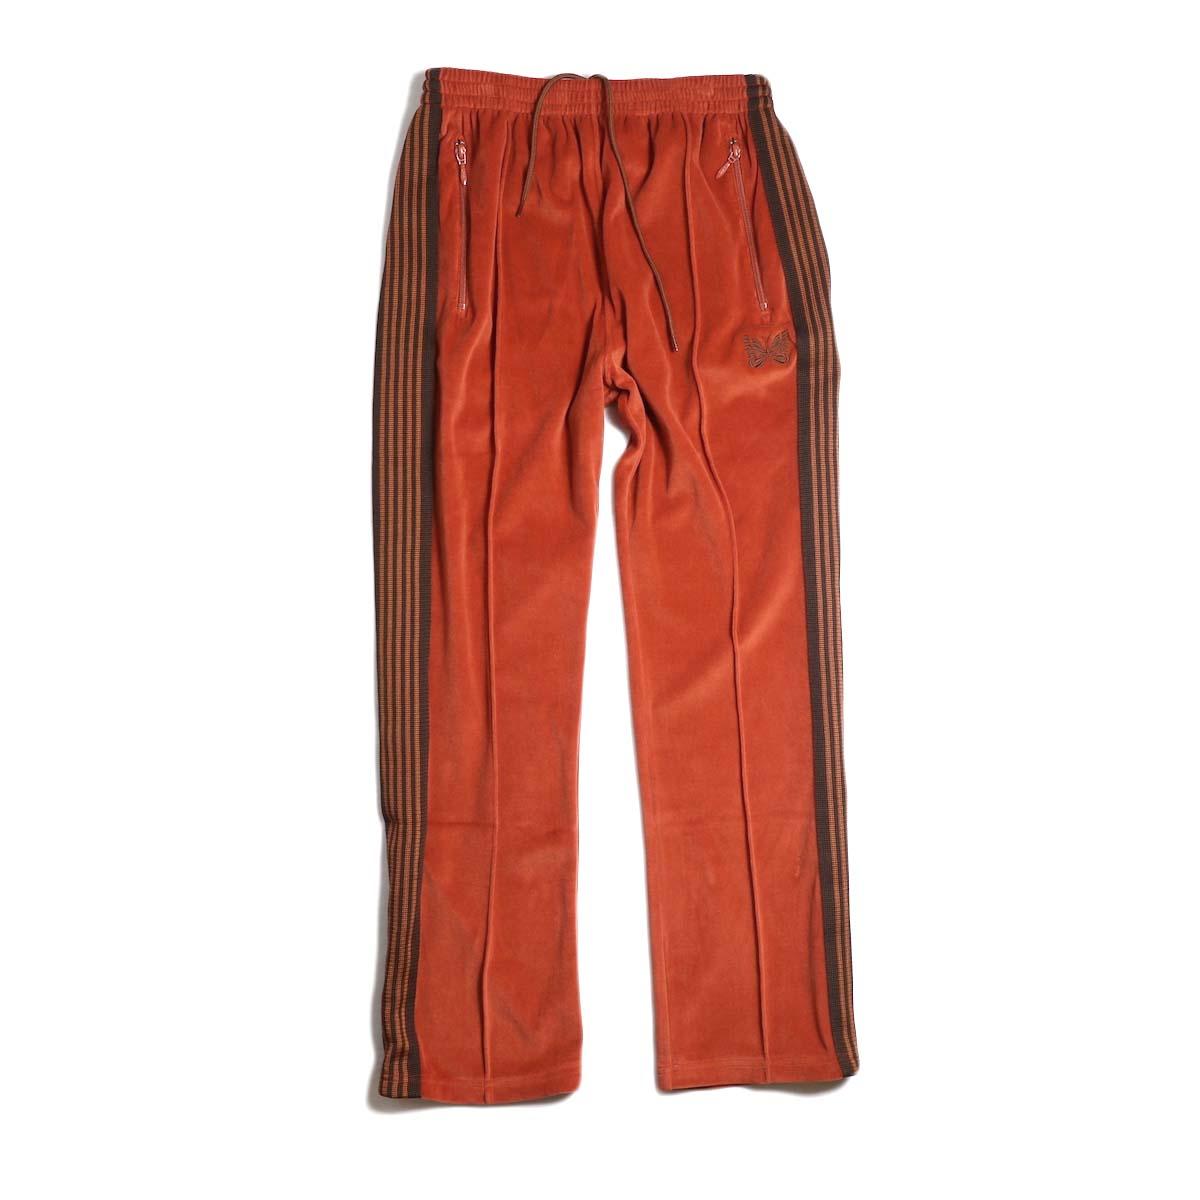 Needles / Narrow Track Pant - C/Pe Velour (Brick)